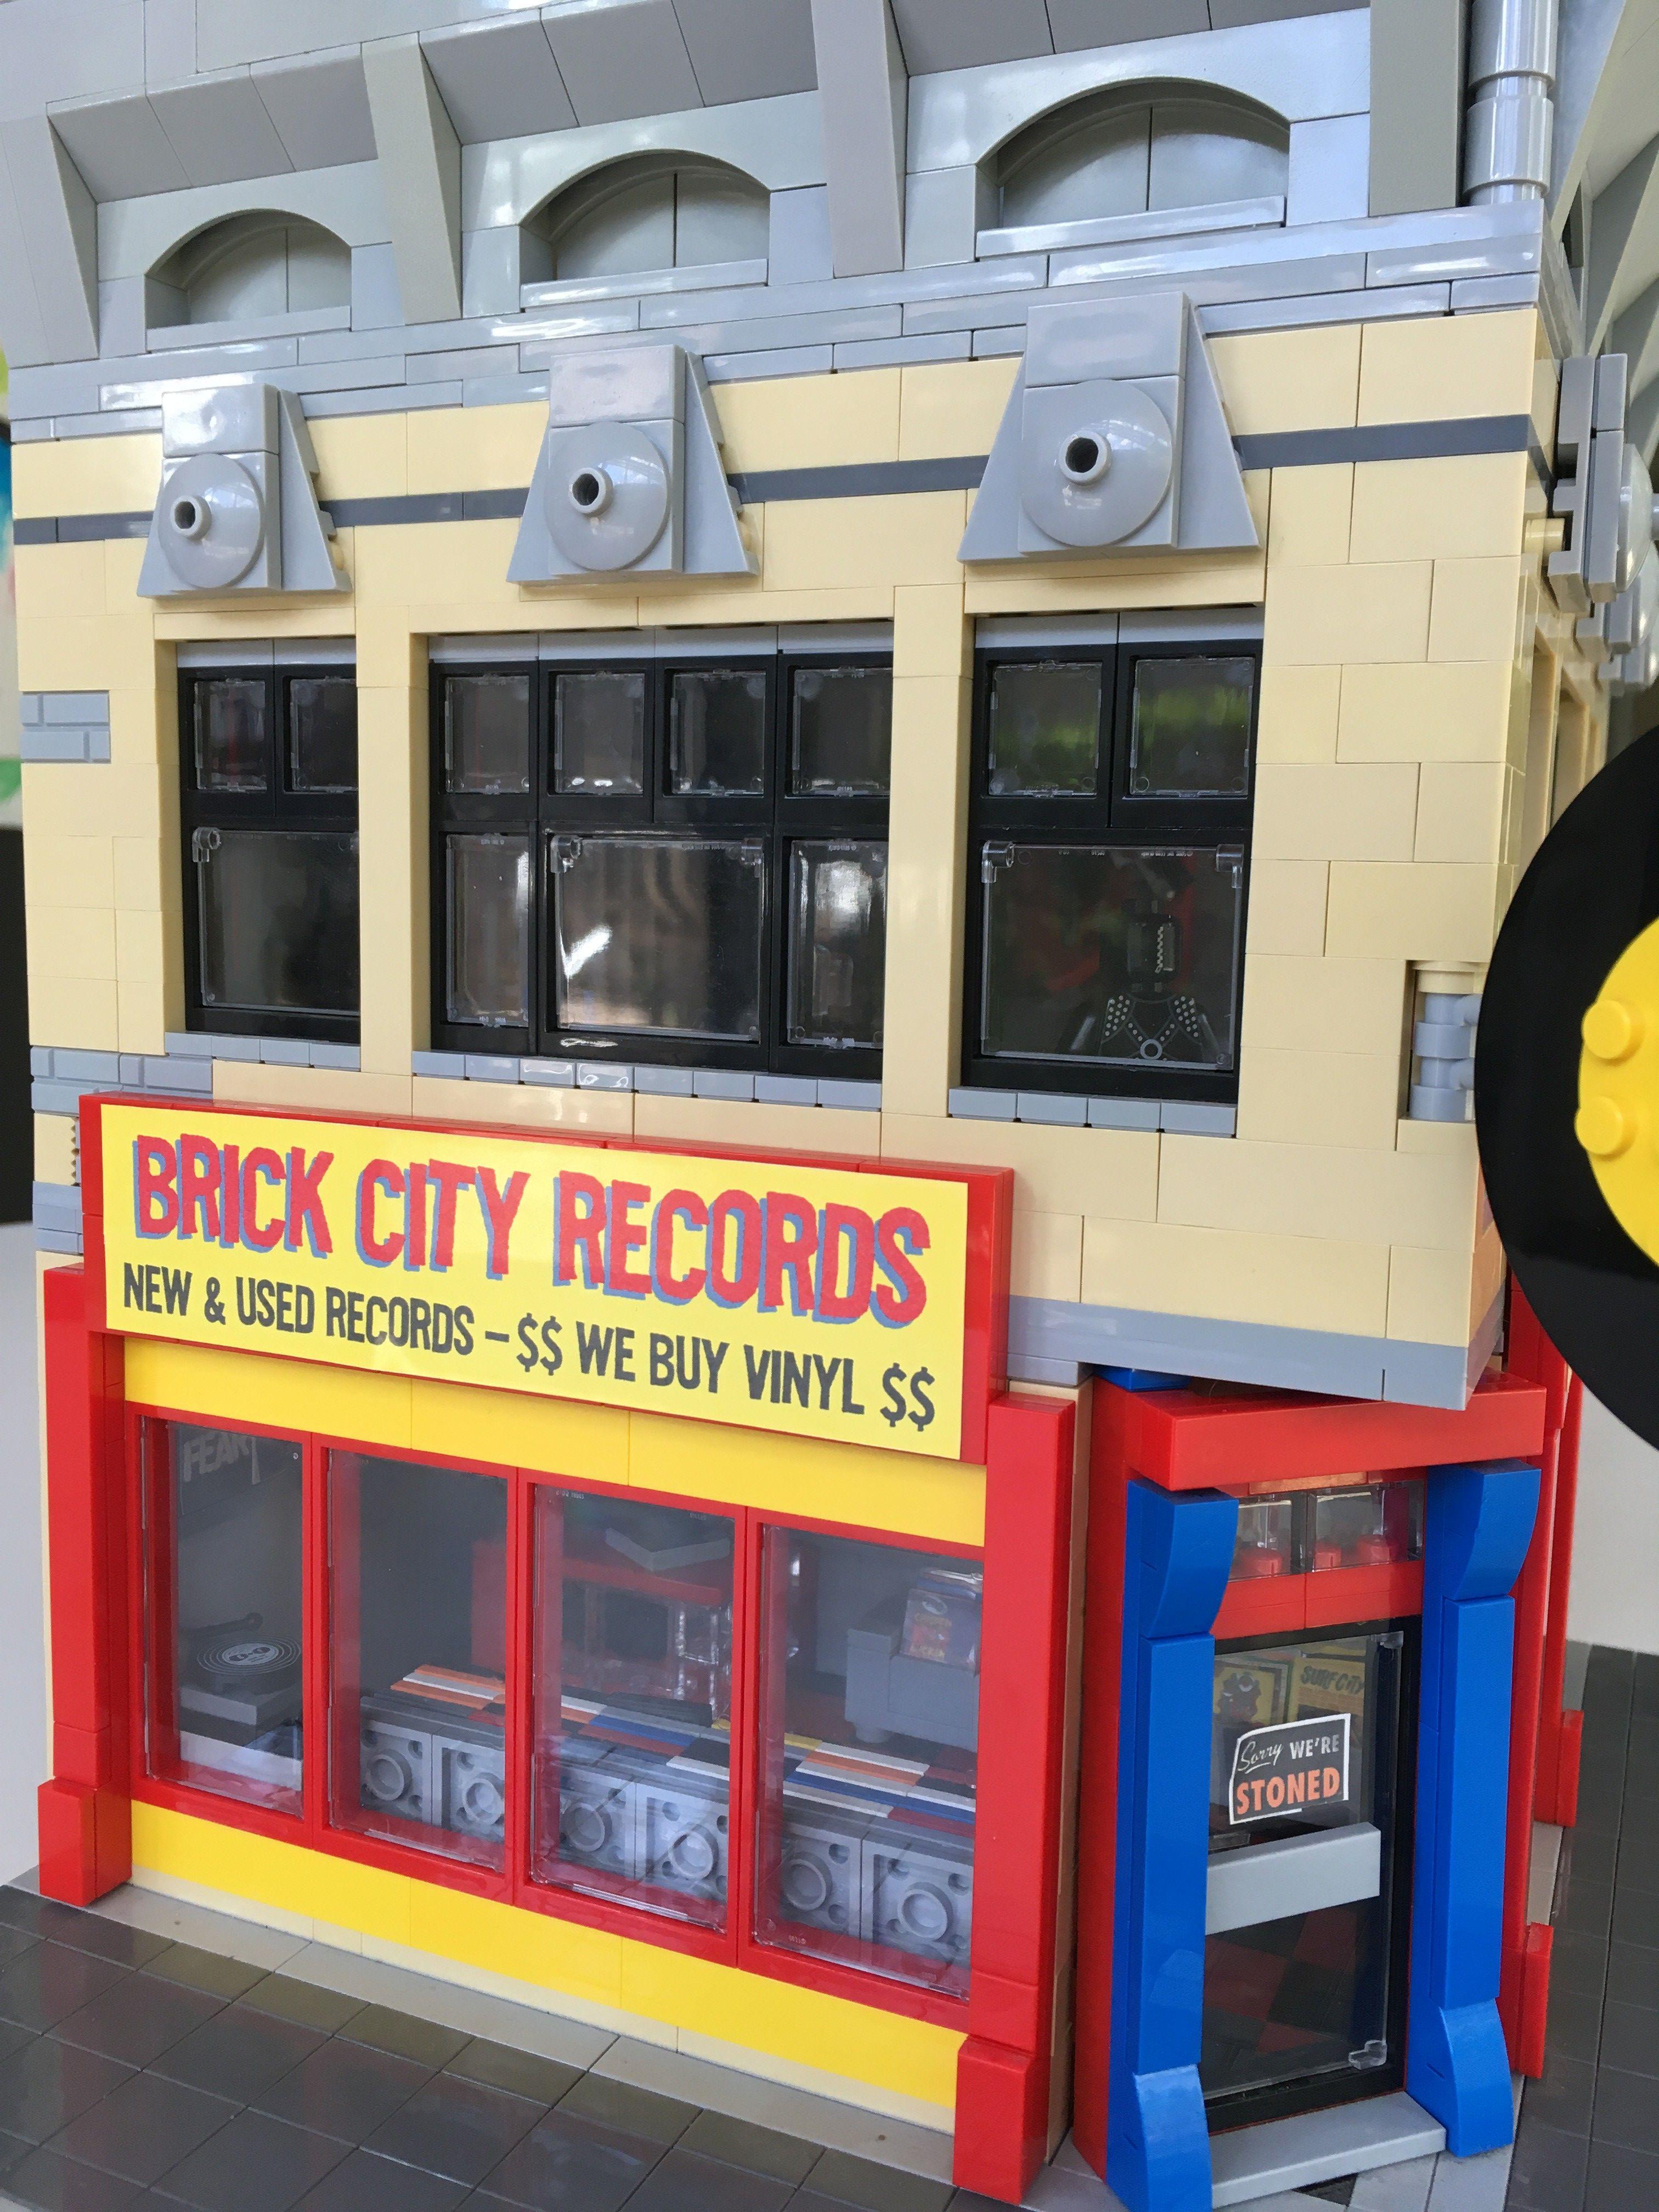 Img 1277 Buy Vinyl Used Records Brick